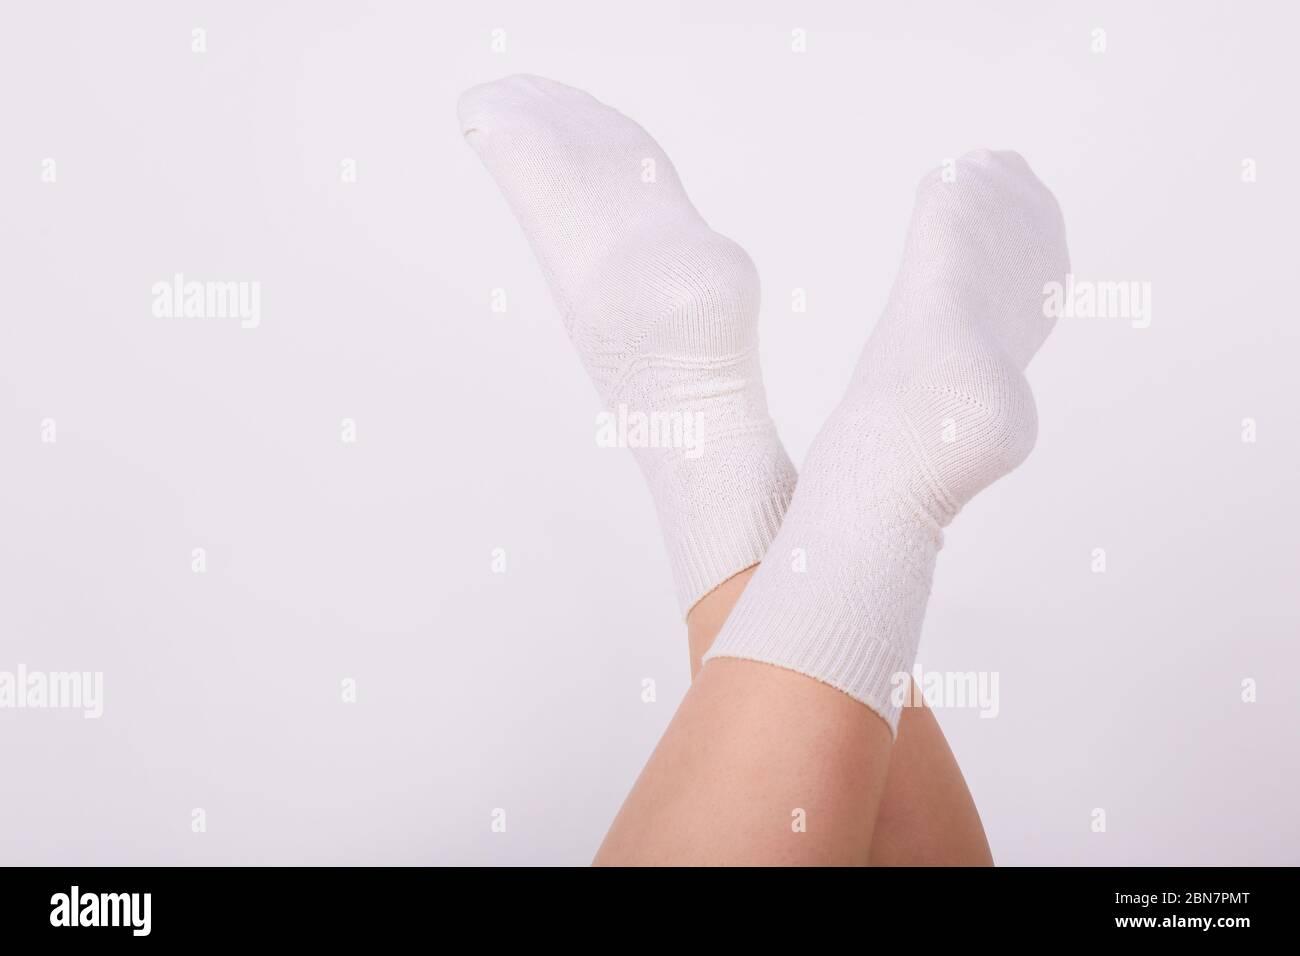 Female legs in white cotton socks on white background. Ladies wearing sports socks Stock Photo